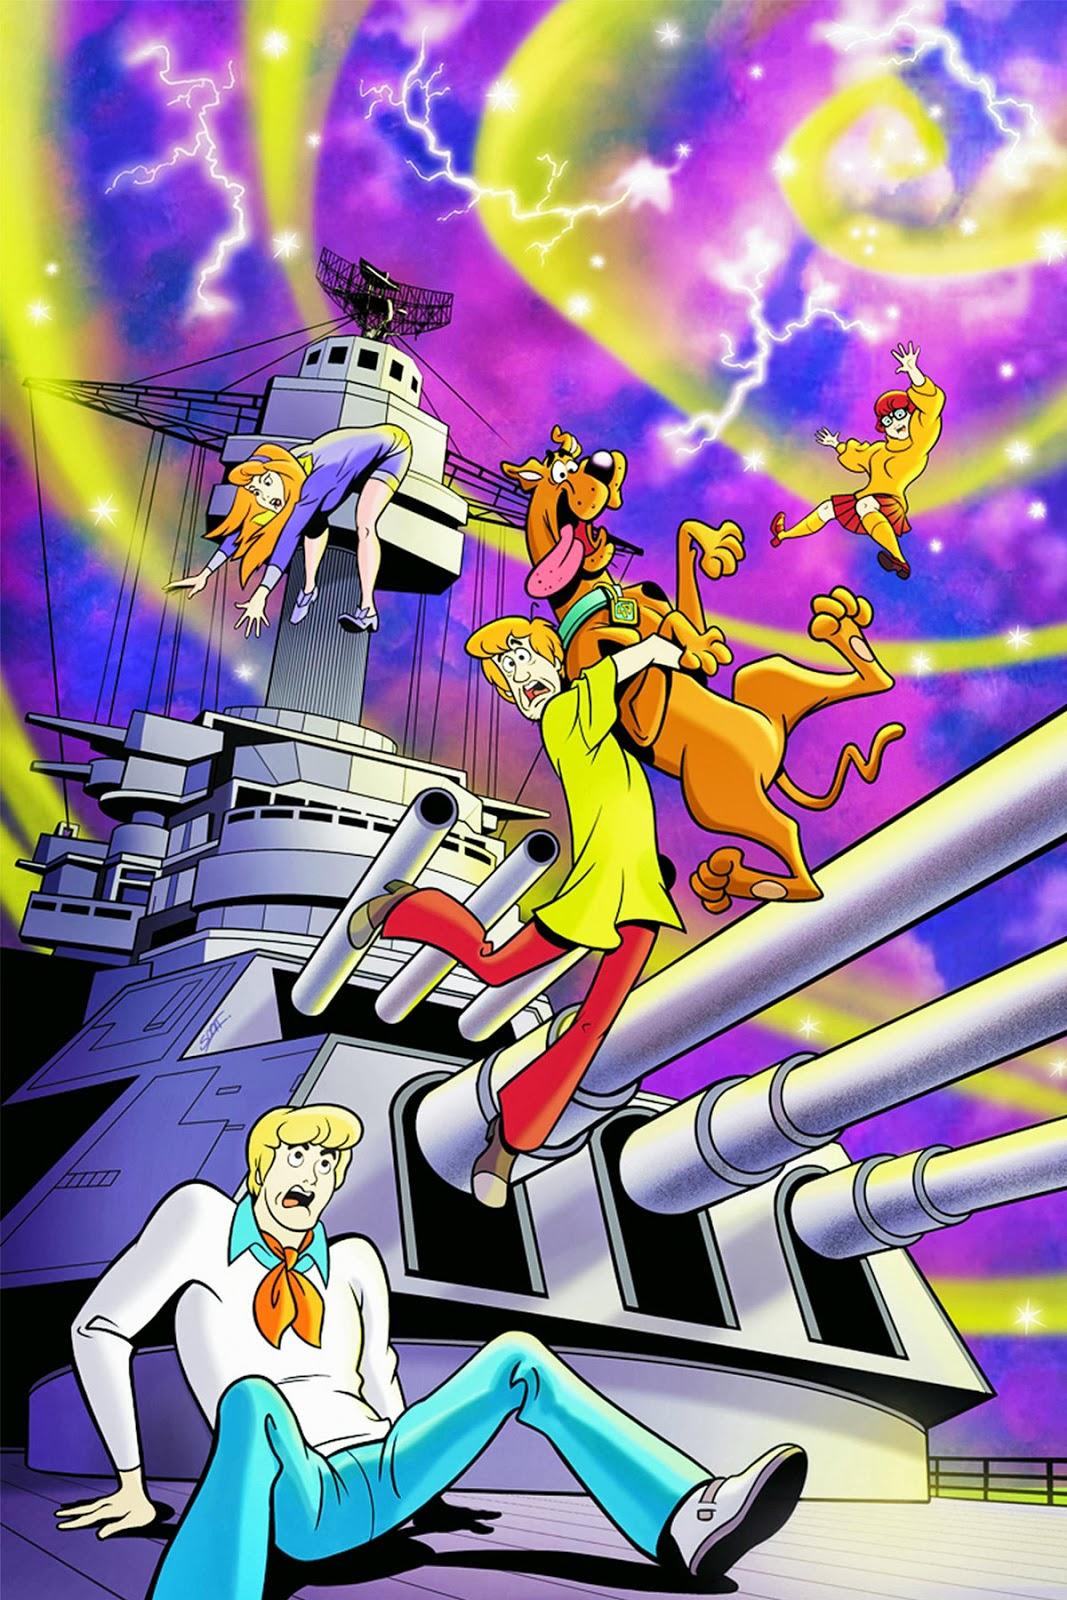 Scooby Doo HD Wallpapers 1080p